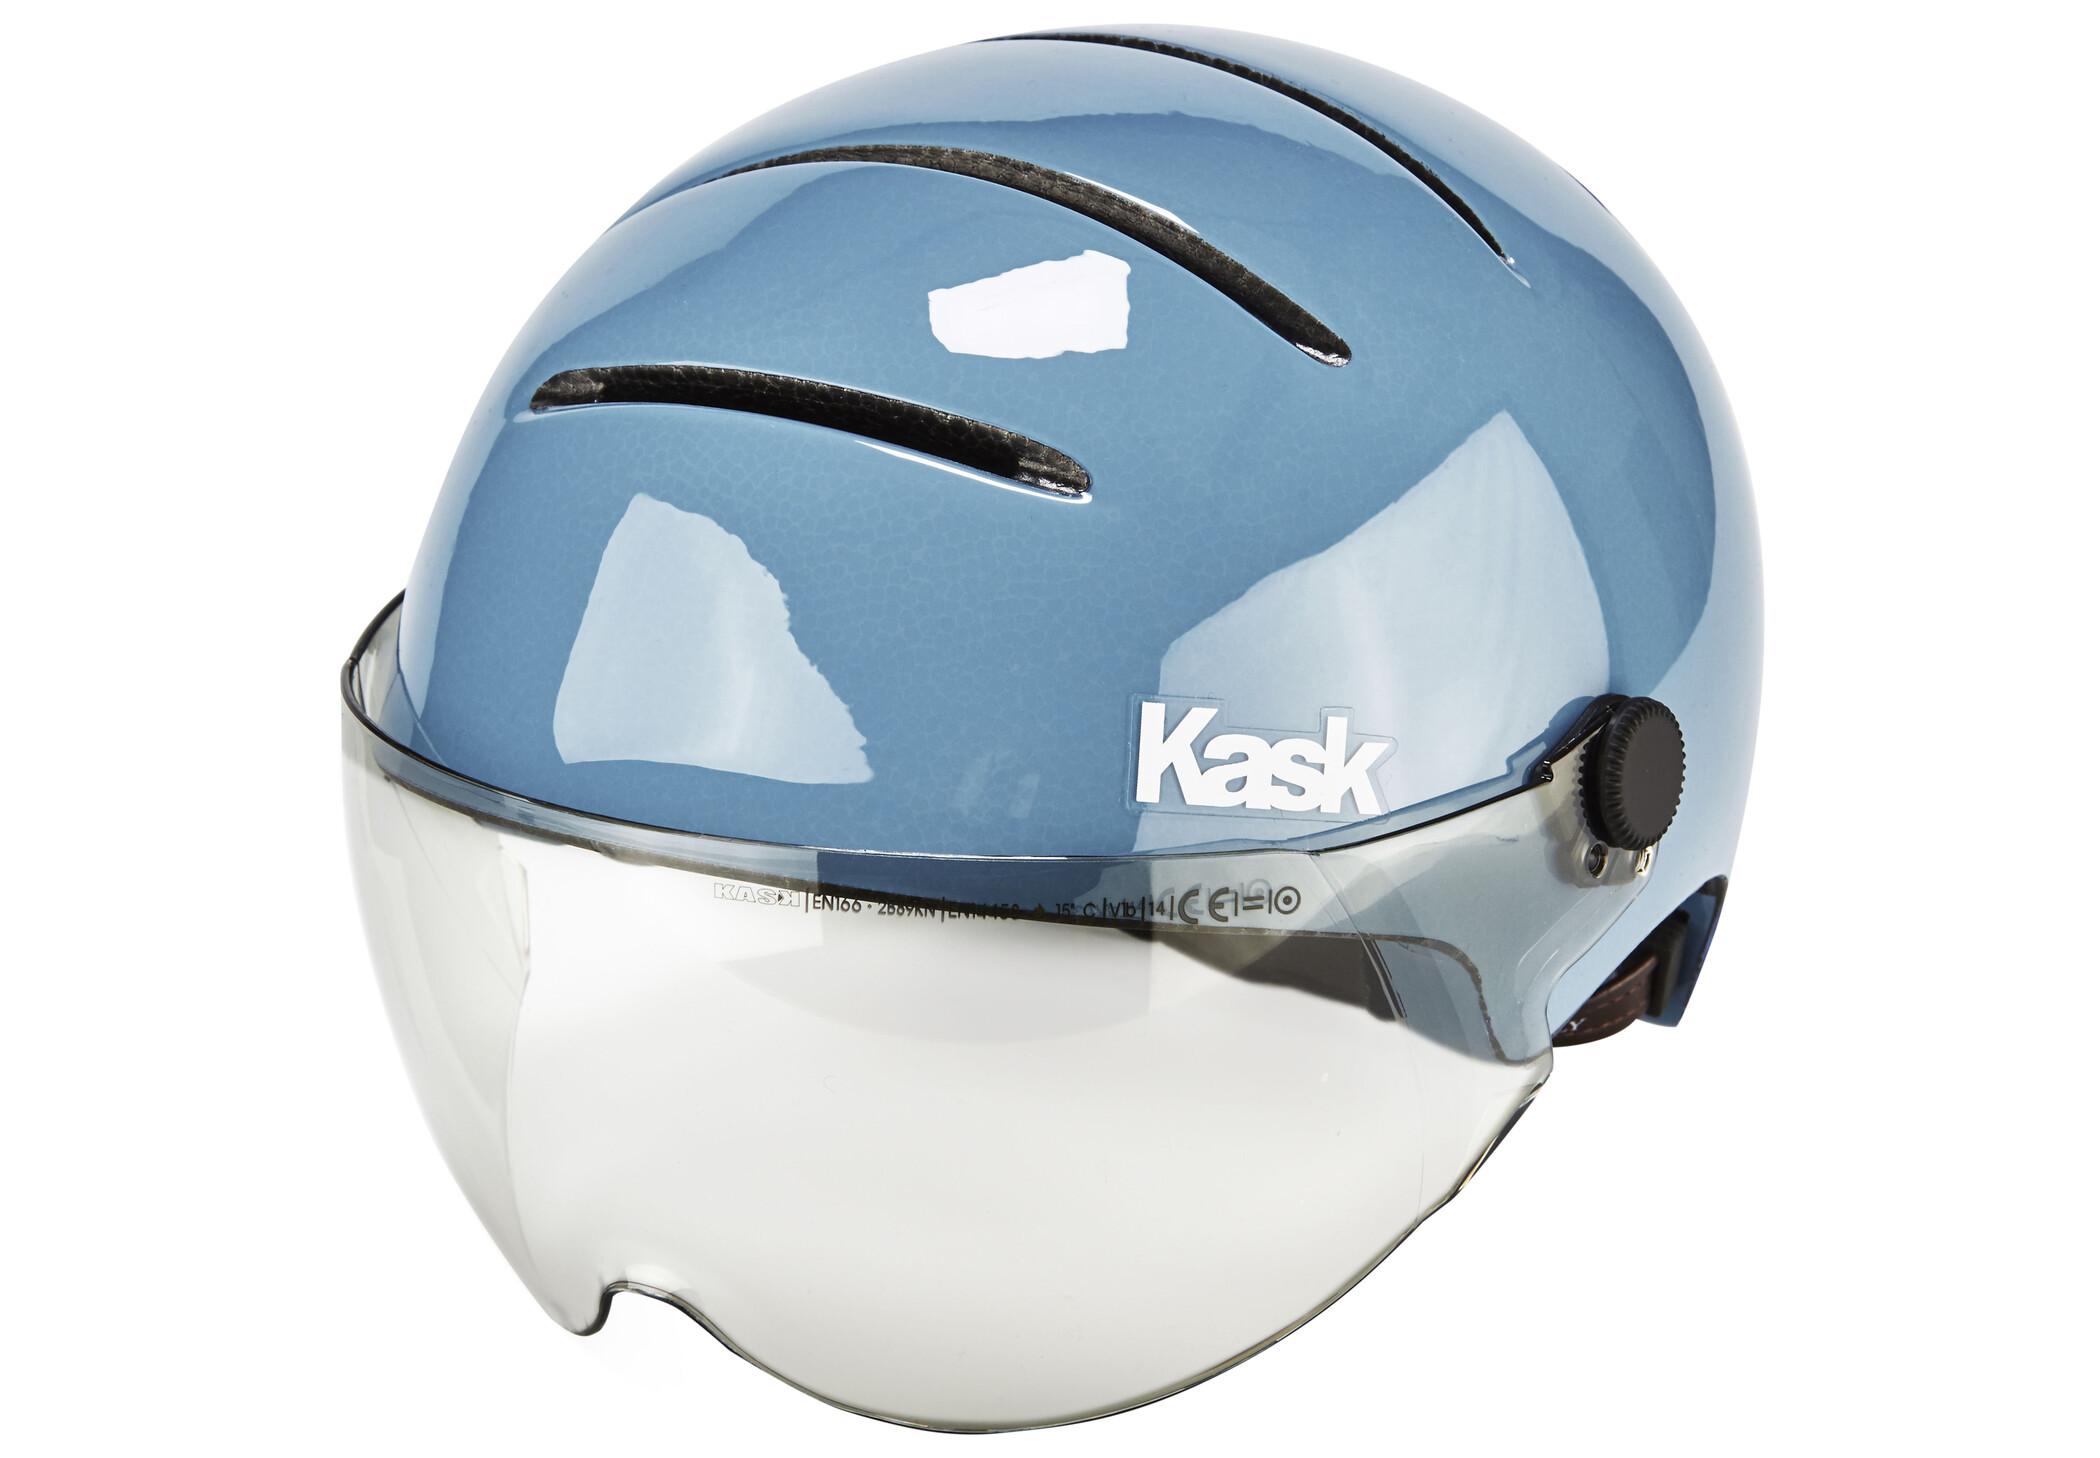 Kask Lifestyle Cykelhjelm inkl. visir, zucchero petrol (2019) | Hjelme